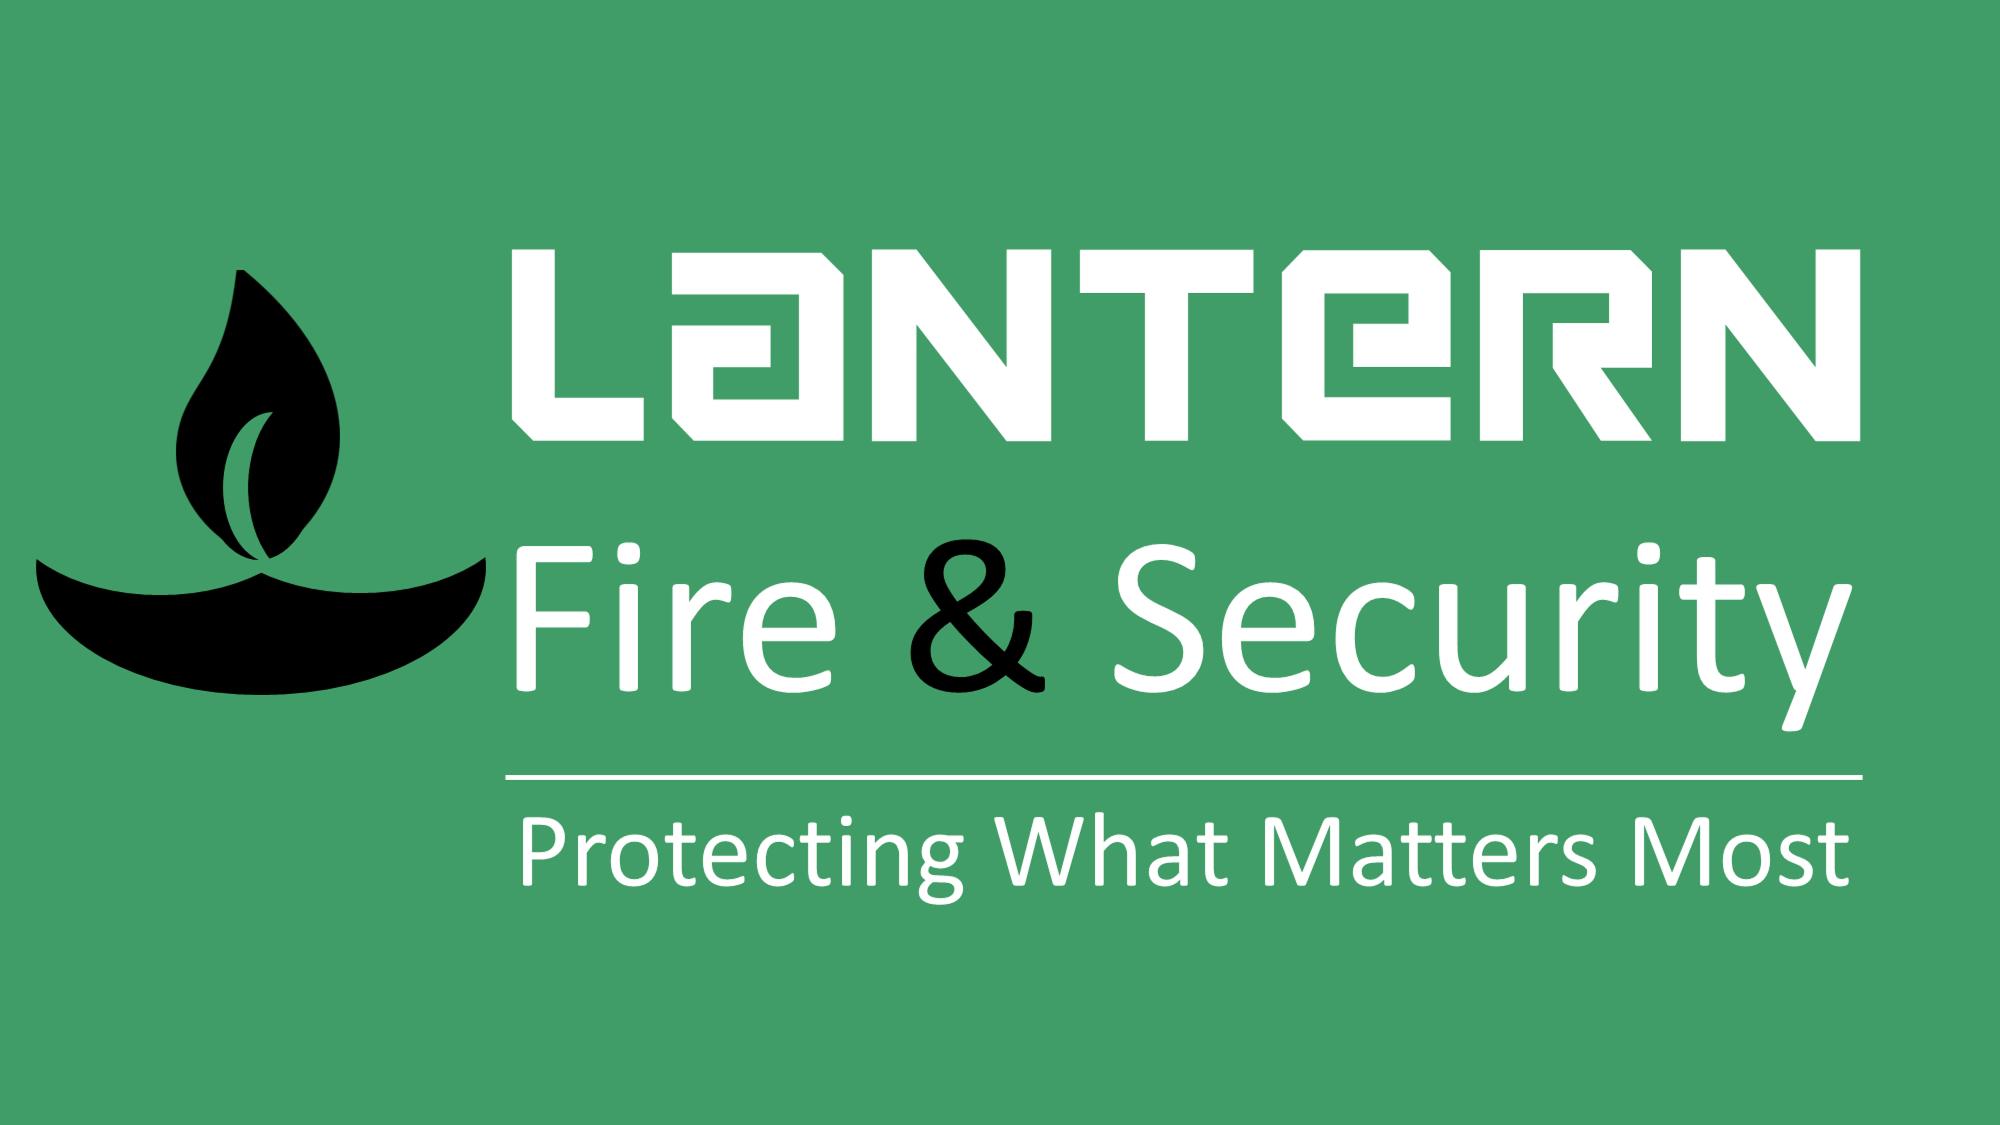 Lantern Fire & Security